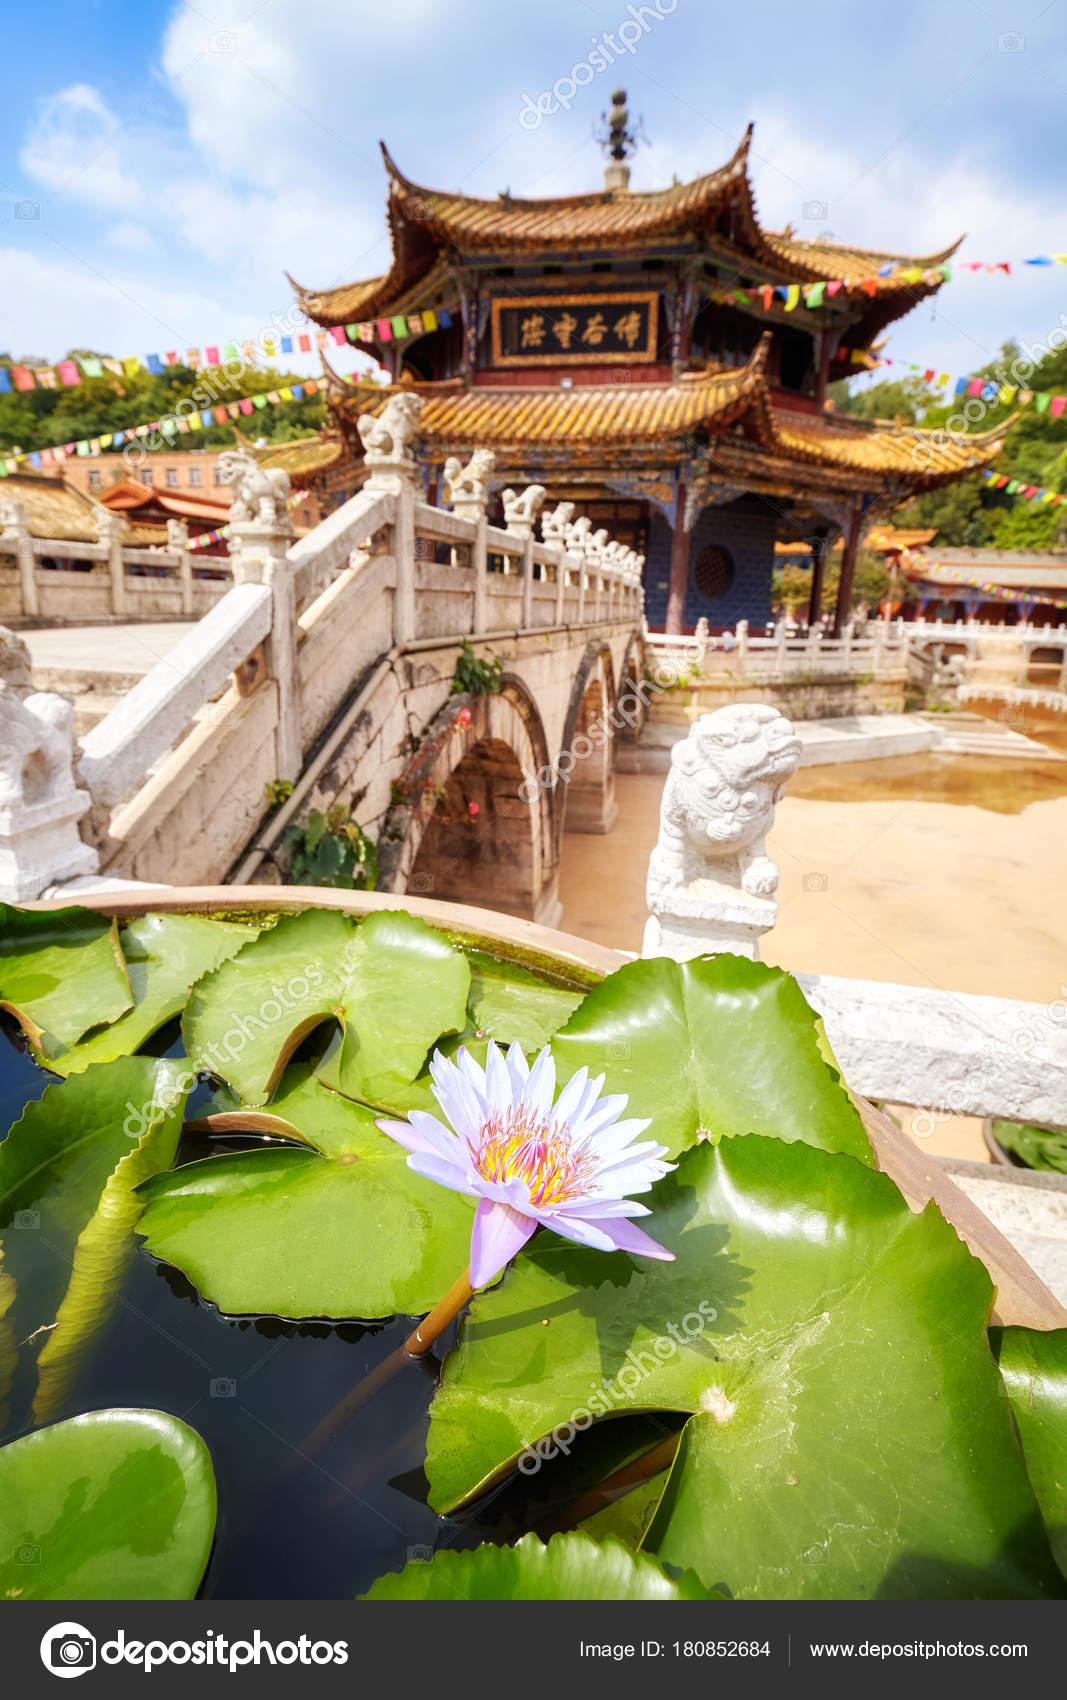 Lotus Flower In The Yuantong Temple In Kunming China Stock